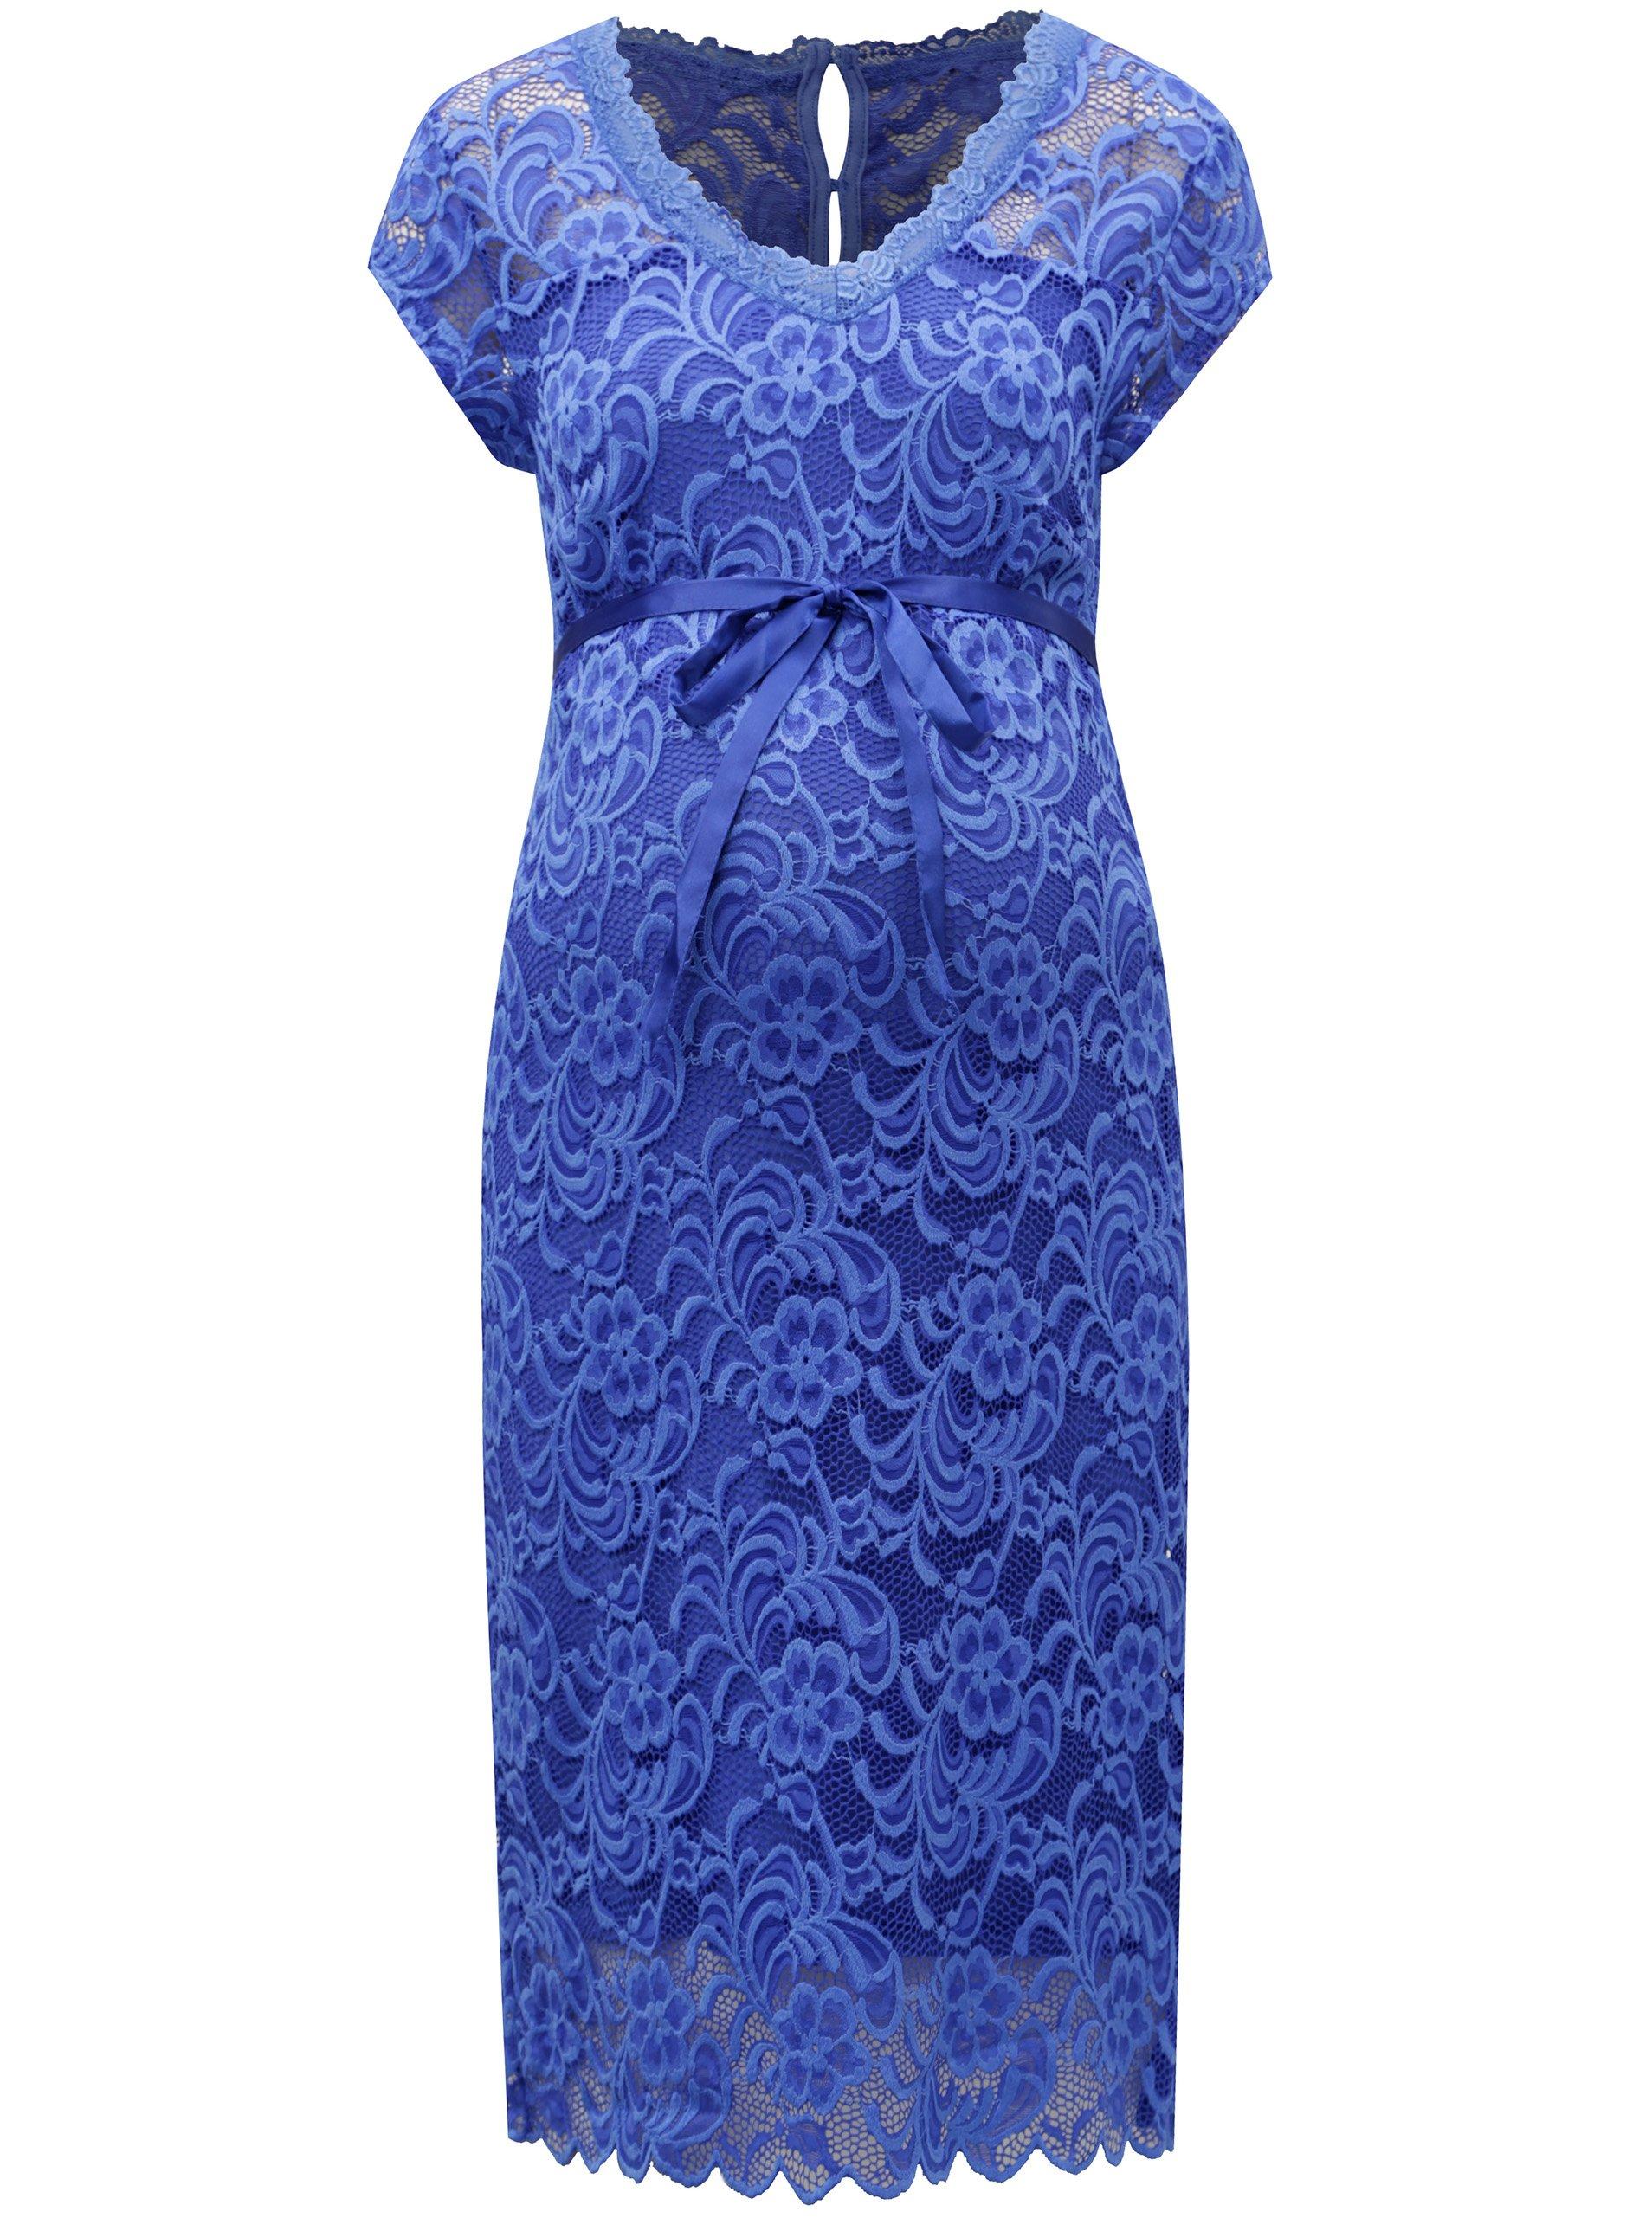 Modré čipkované tehotenské šaty Mama.licious New mivana  2dea59406ed